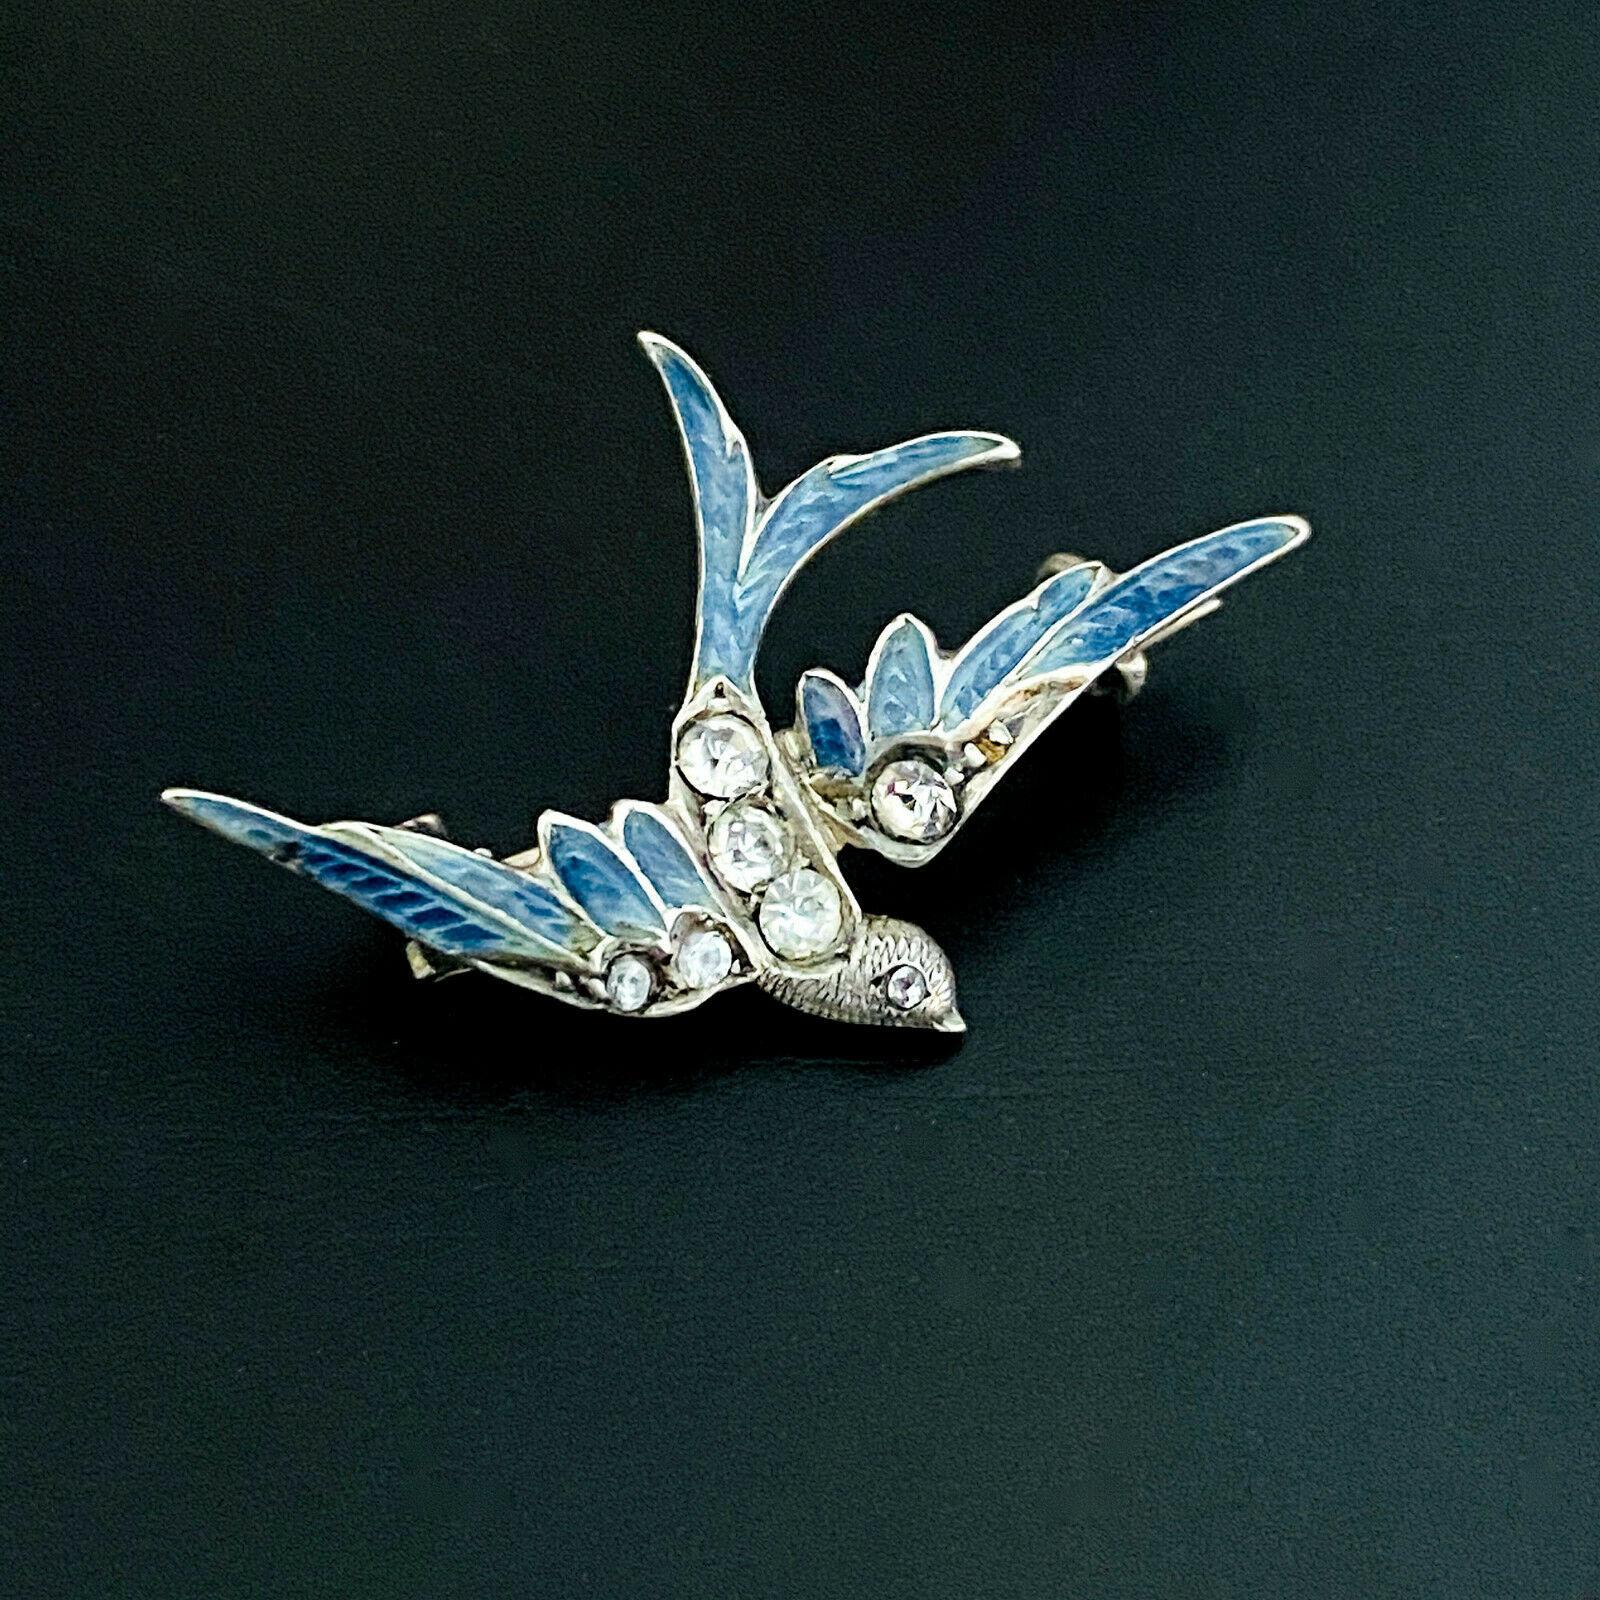 Antique, Victorian Silver black dot paste flying swallow/swift/blue bird brooch